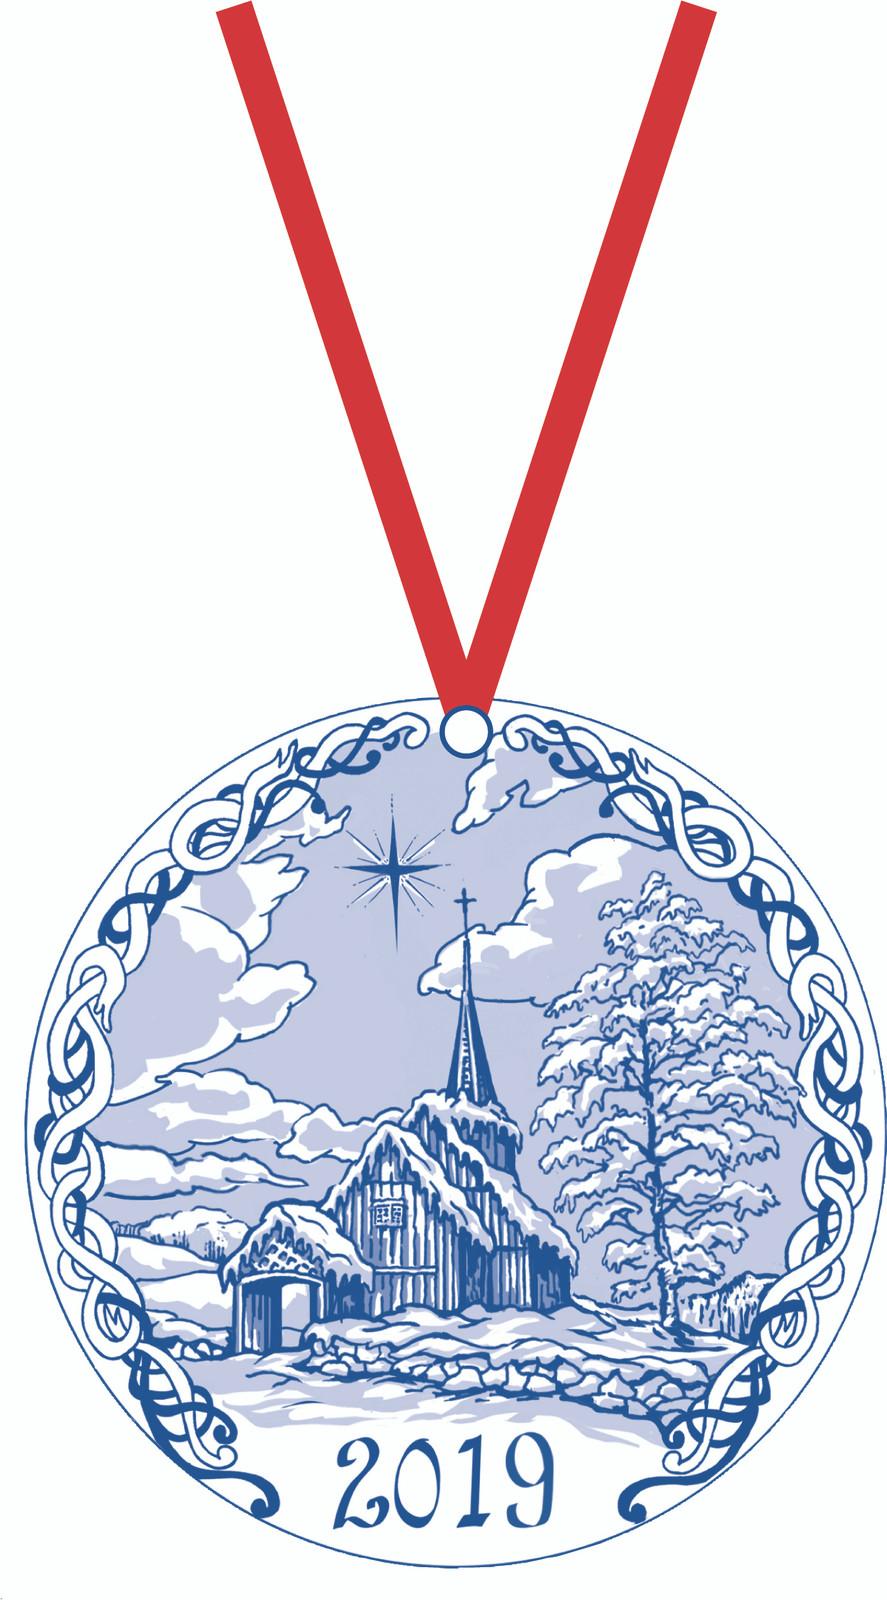 2019 Stav Church Ornament - Hegge